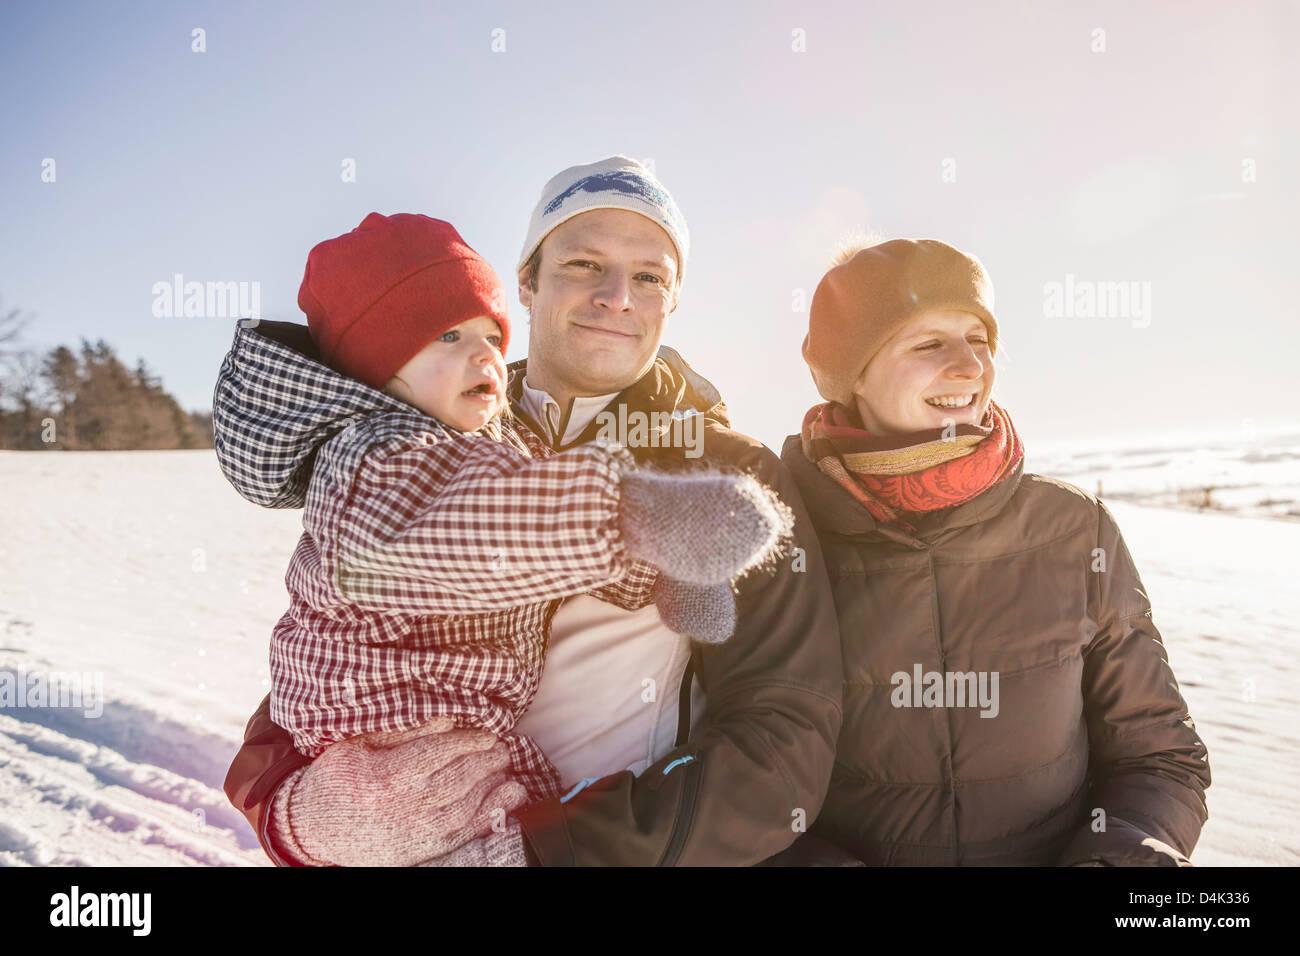 Lächelnde Familie Wandern im Schnee Stockbild